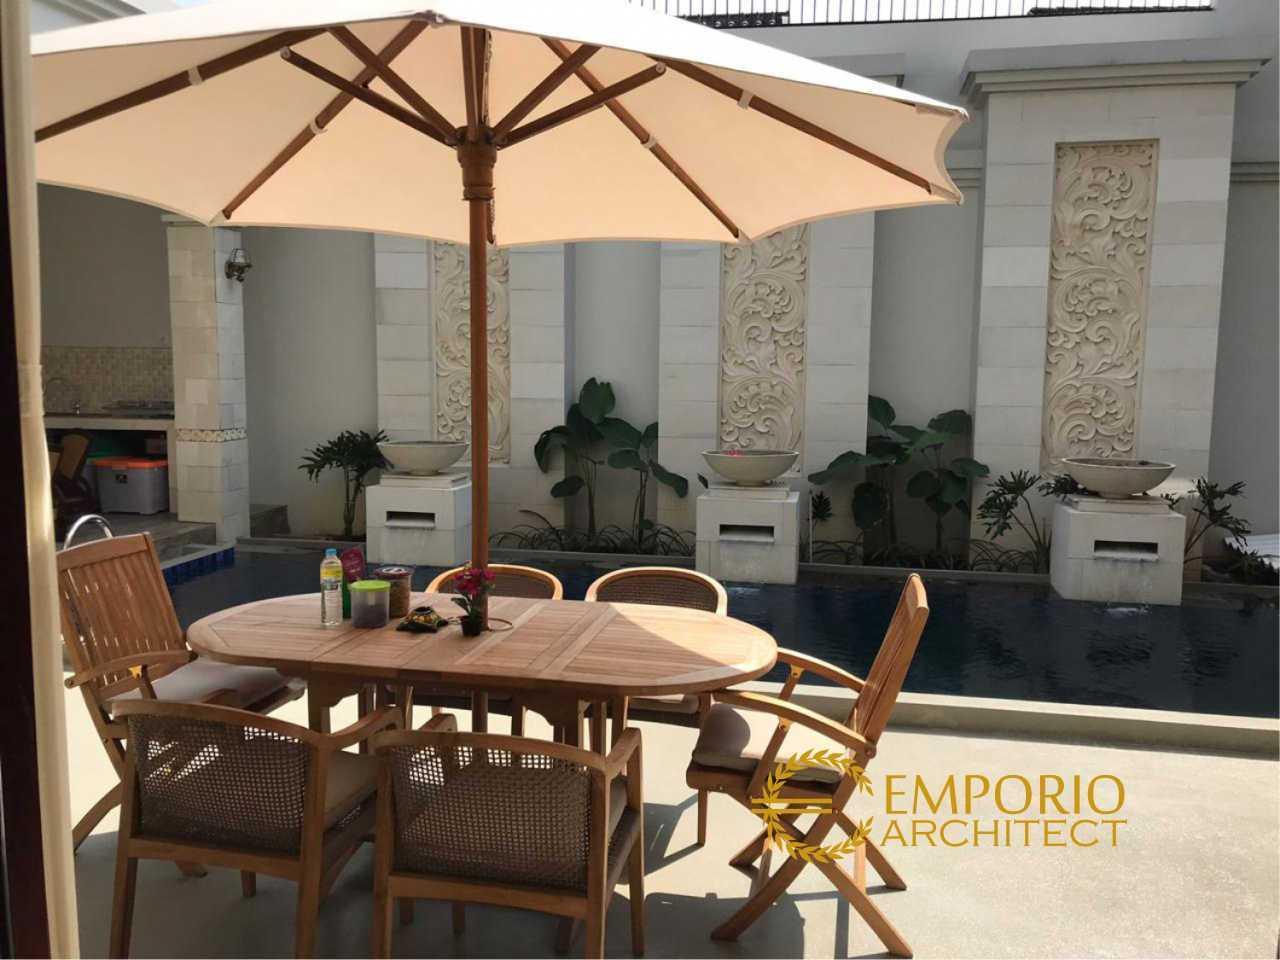 Emporio Architect Jasa Arsitek Bintaro Hasil Konstruksi Rumah Villa Bali Tropis 268 @ Bintaro, Jakarta Selatan Bintaro, Kec. Pesanggrahan, Kota Jakarta Selatan, Daerah Khusus Ibukota Jakarta, Indonesia Bintaro, Kec. Pesanggrahan, Kota Jakarta Selatan, Daerah Khusus Ibukota Jakarta, Indonesia Emporio-Architect-Jasa-Arsitek-Bintaro-Hasil-Konstruksi-Rumah-Villa-Bali-Tropis-268-Bintaro-Jakarta-Selatan  92361